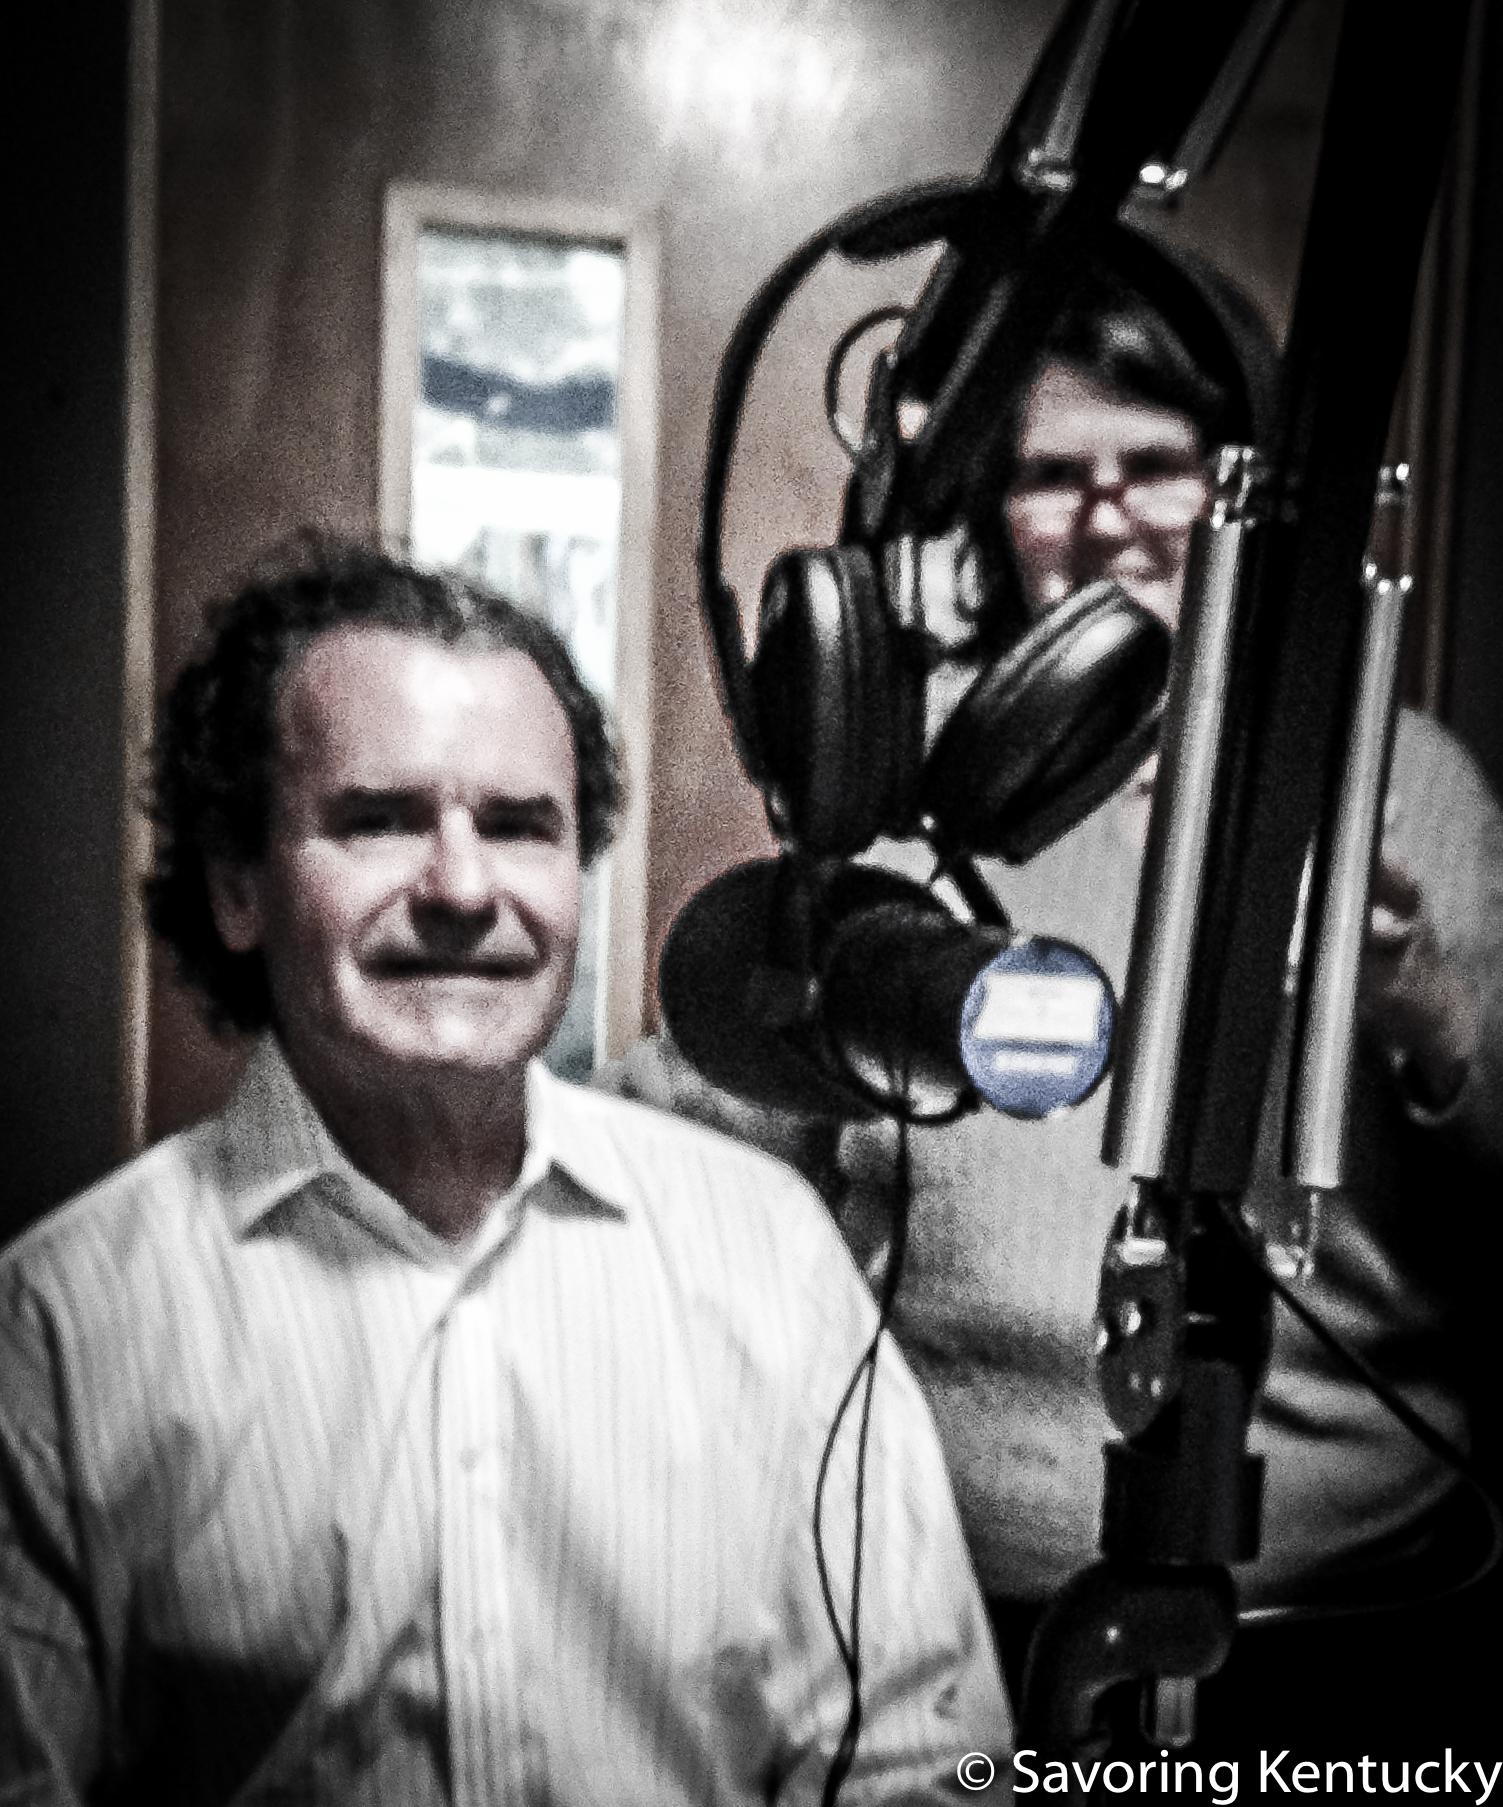 Mark Newberry, left, and Ouita Michel at Lexington Community Radio's studio, March, 2016